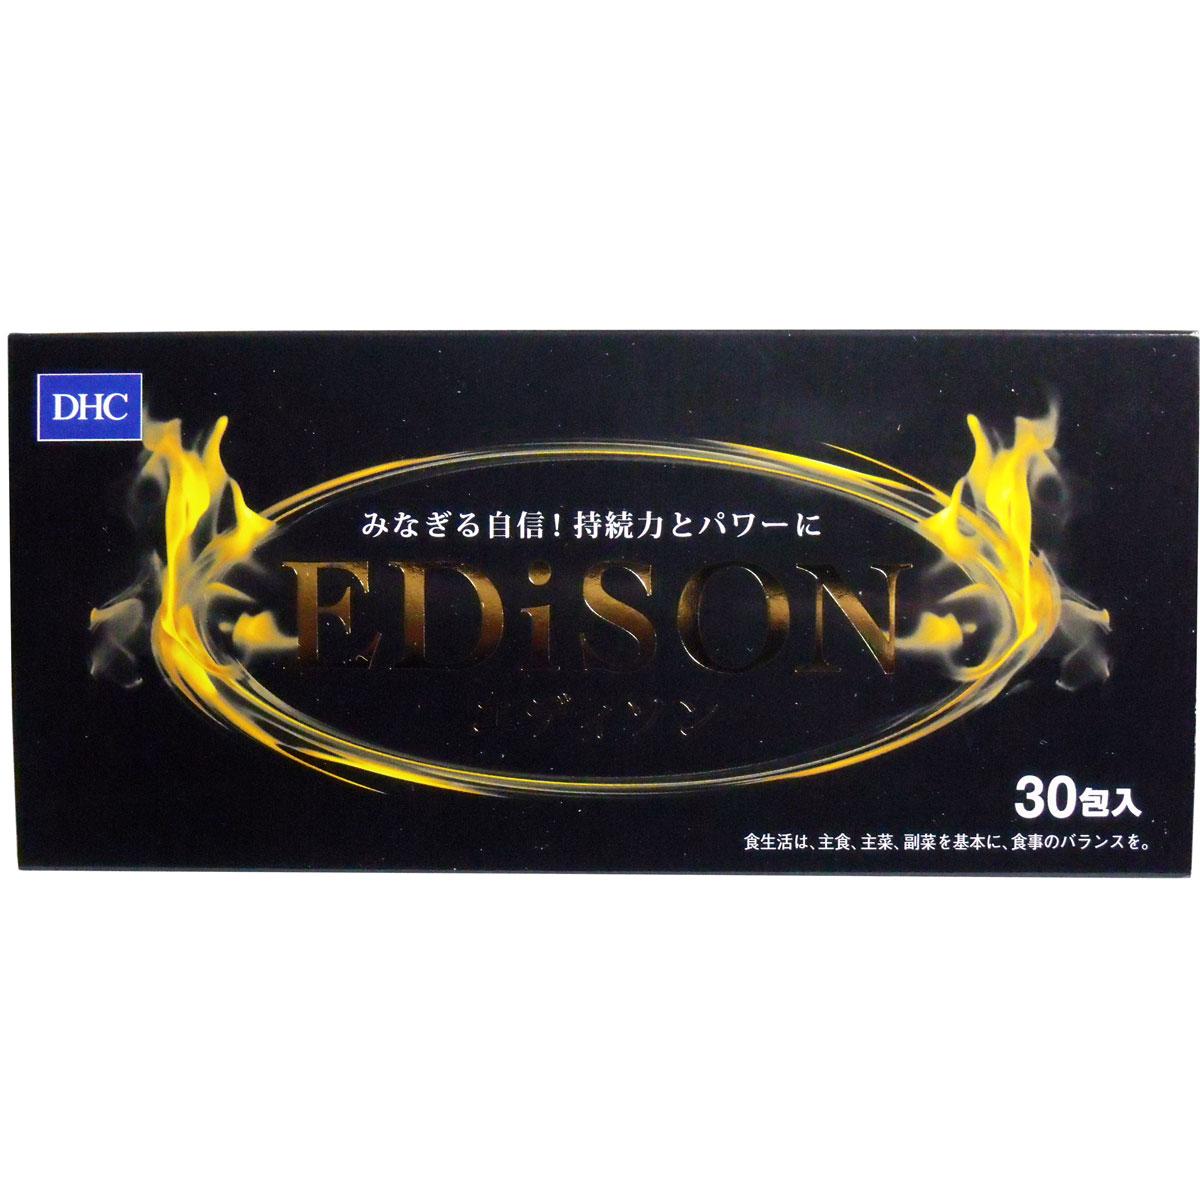 30 sachet DHC EDiSON ( Edison )